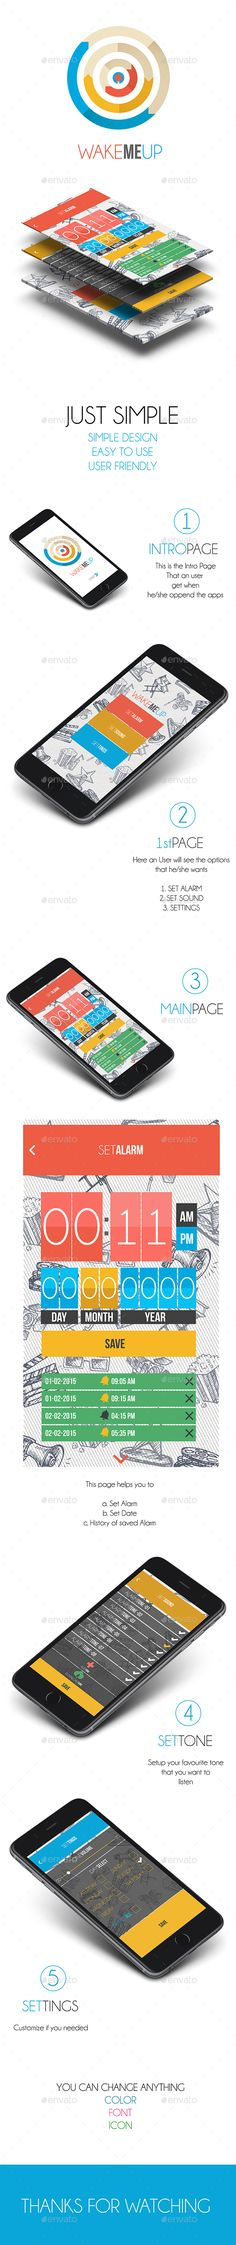 Alarm Application (User Interface Design) (User Interfaces)